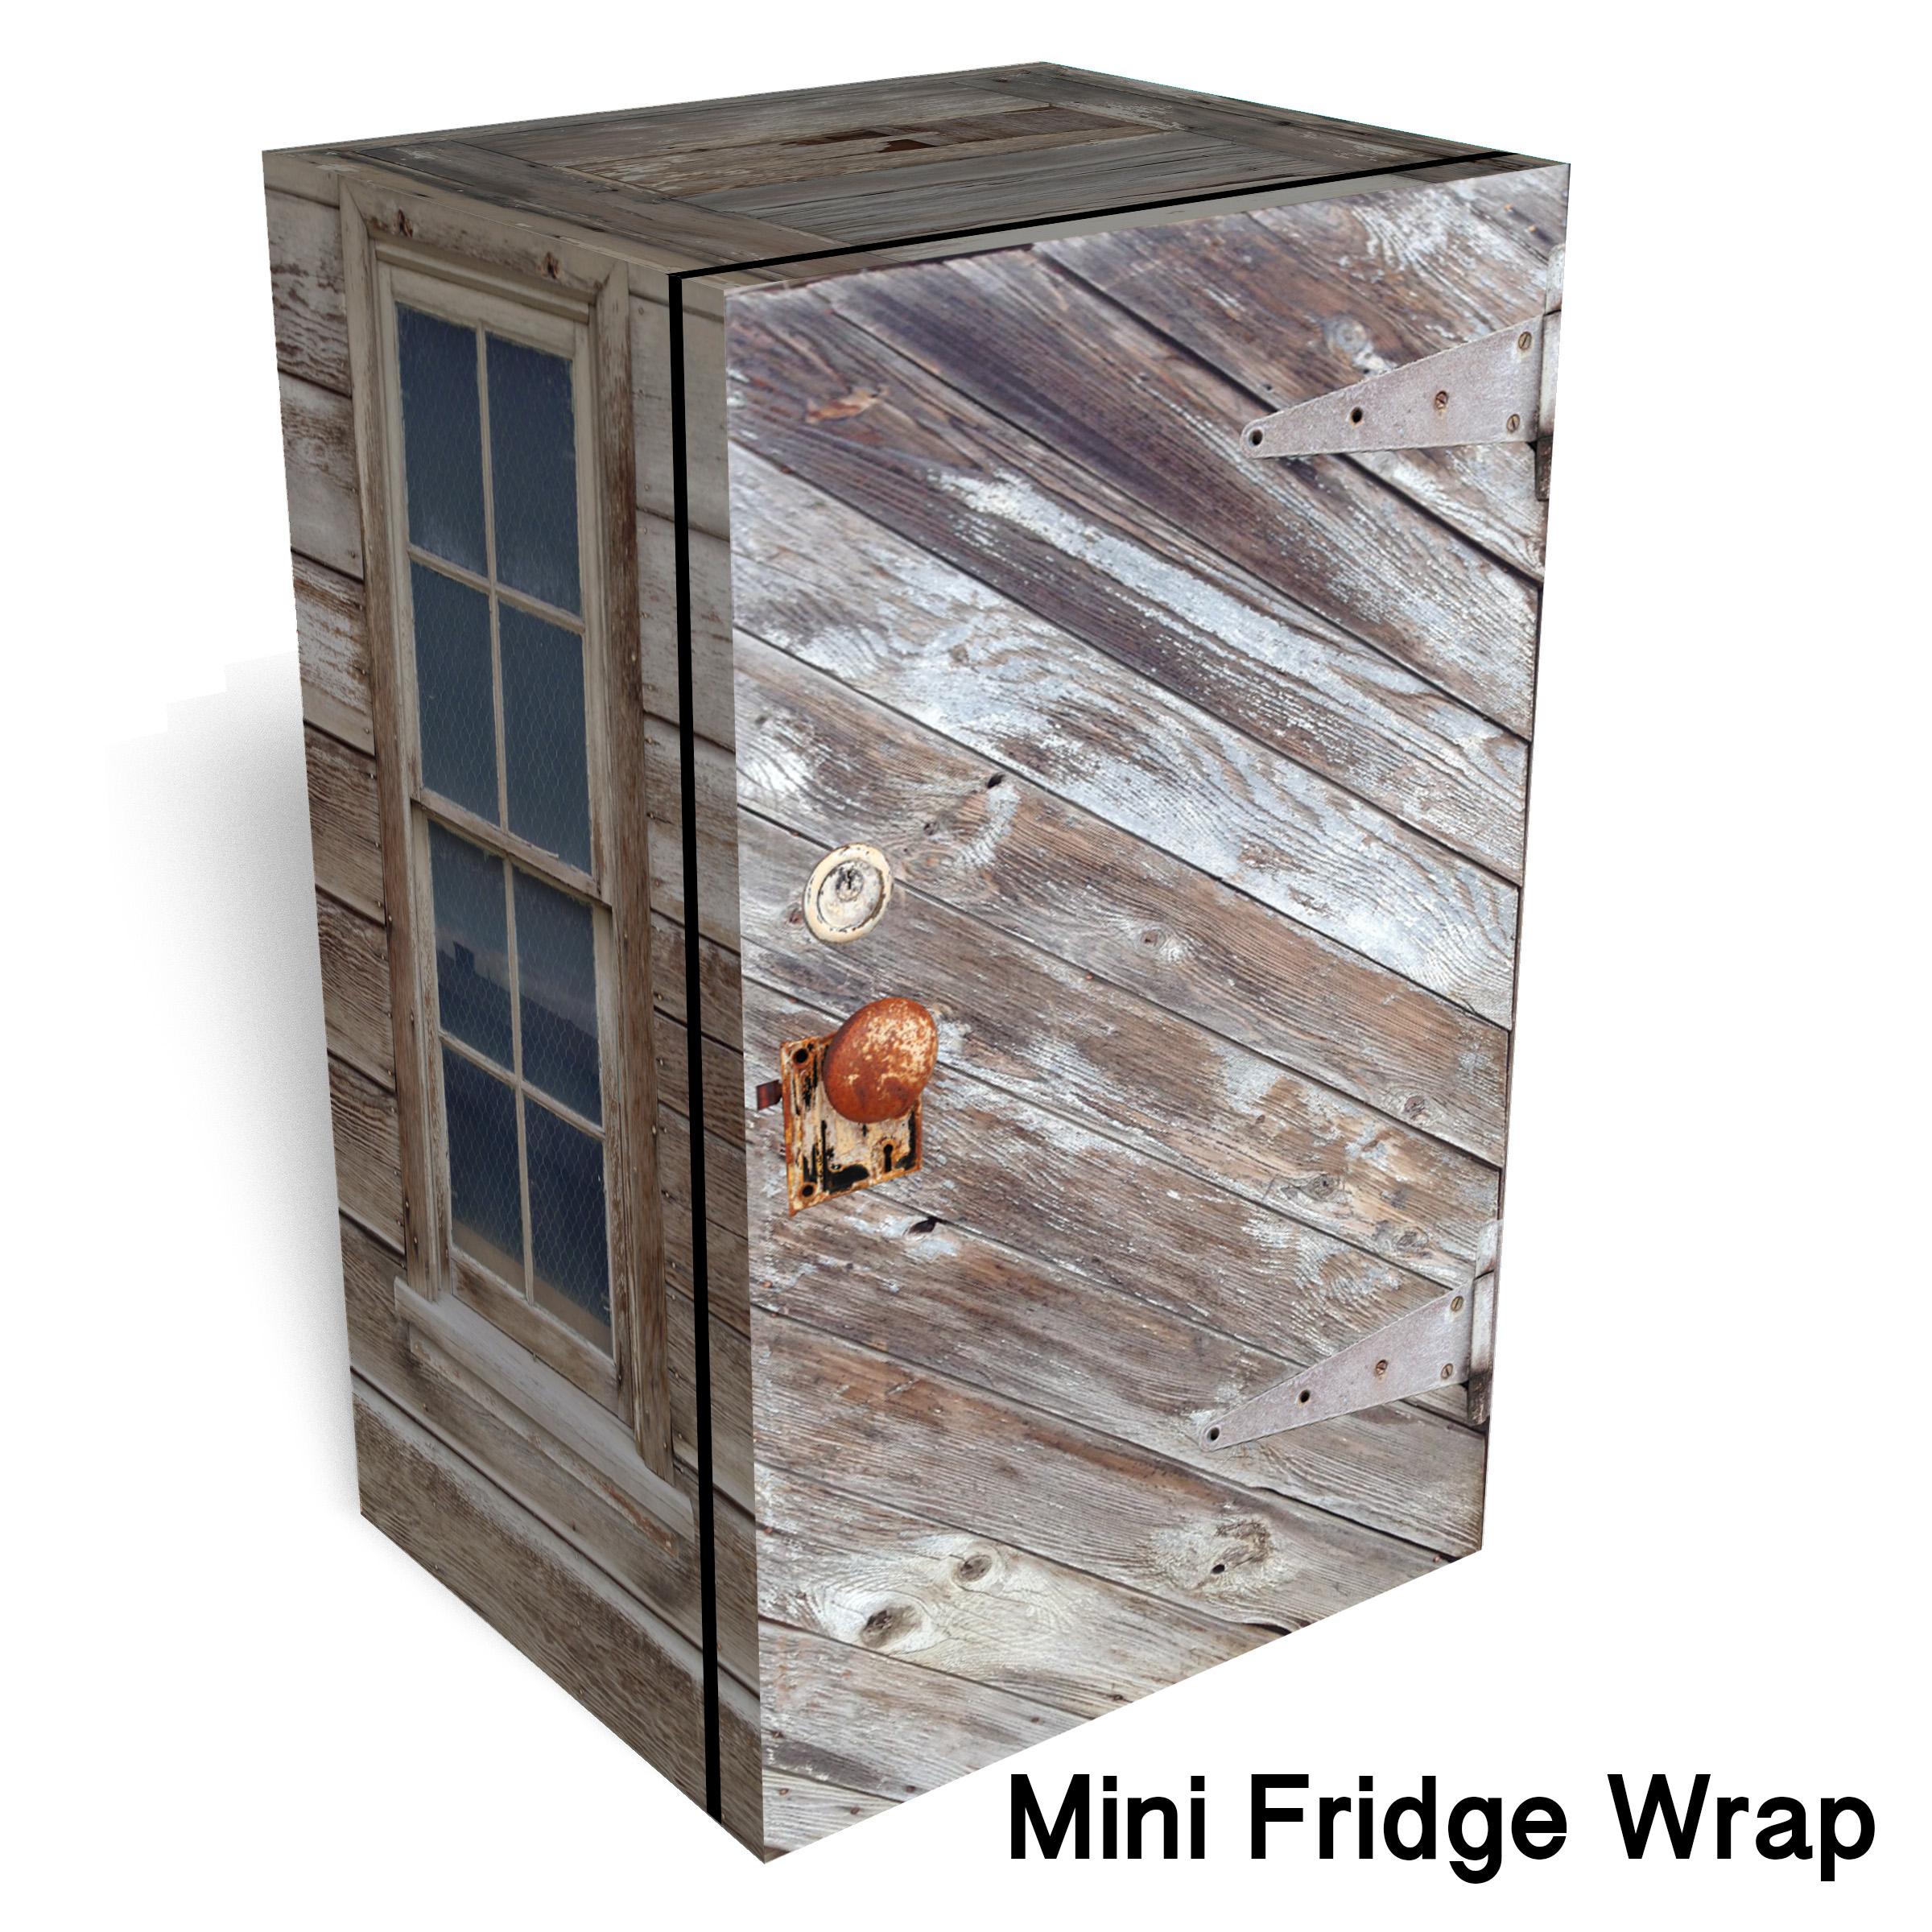 Ghost Town Shed Mini Fridge Wrap